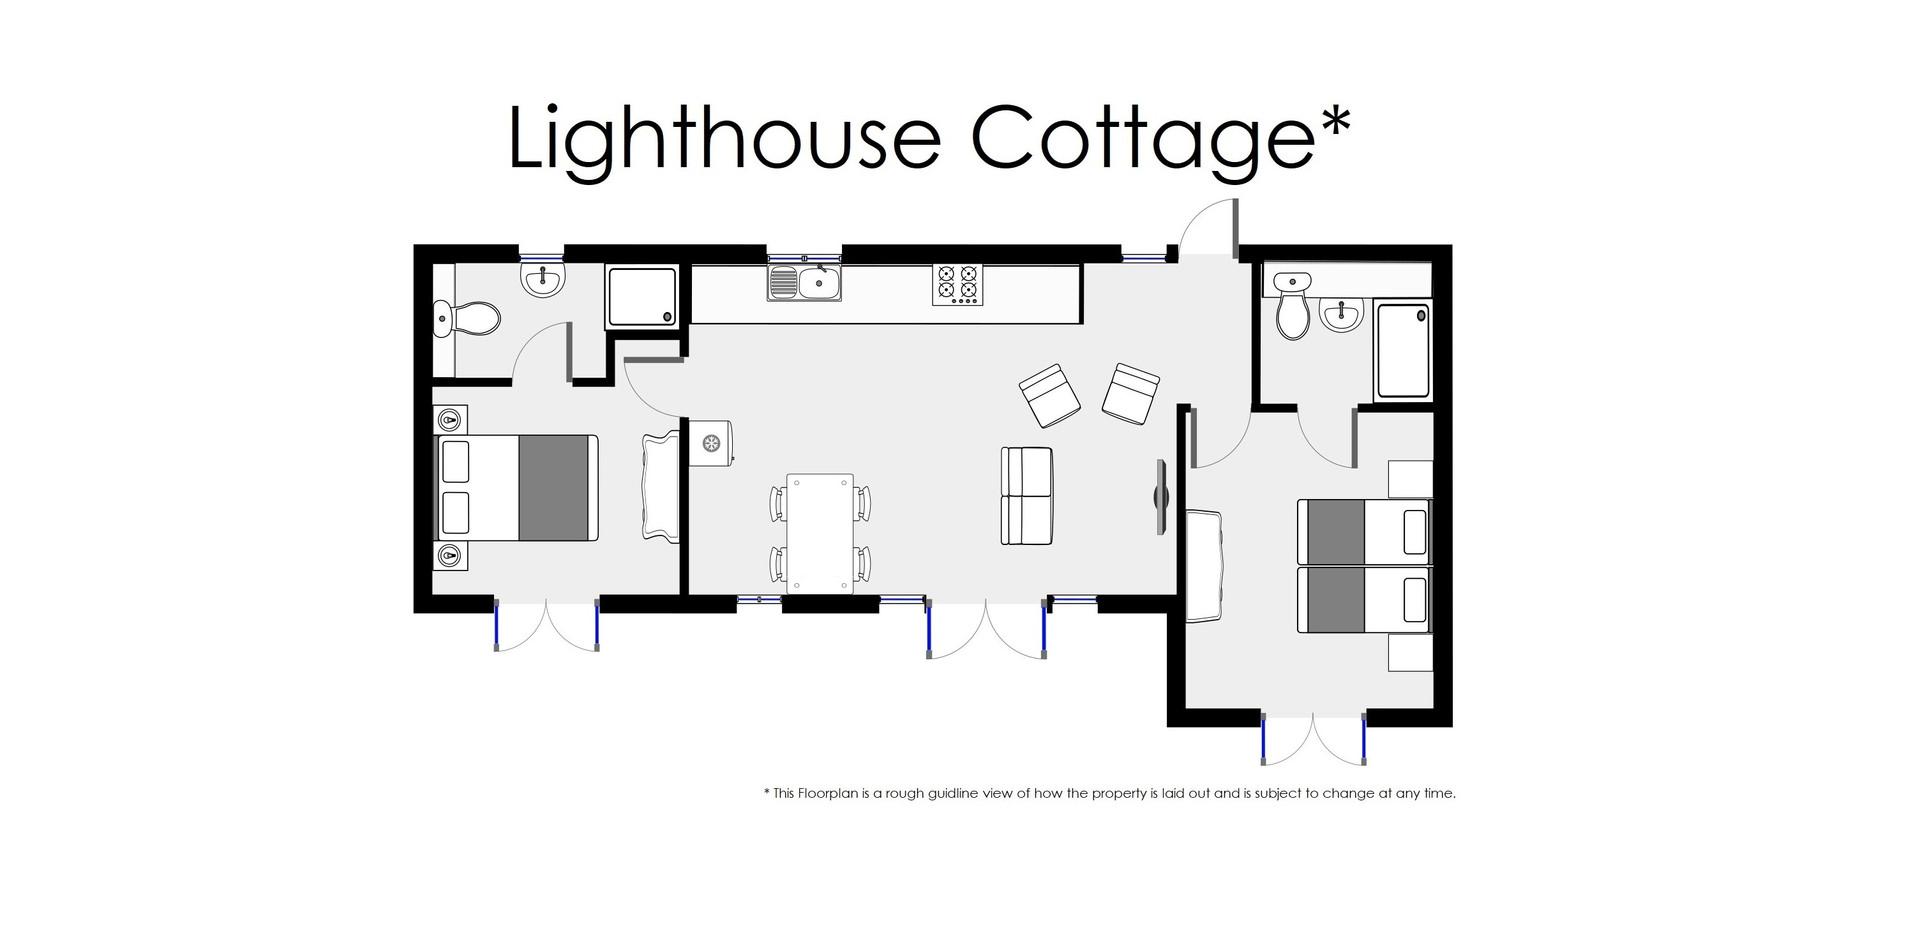 Floorplan - Lighthouse Cottage - Oak Tree Cottages